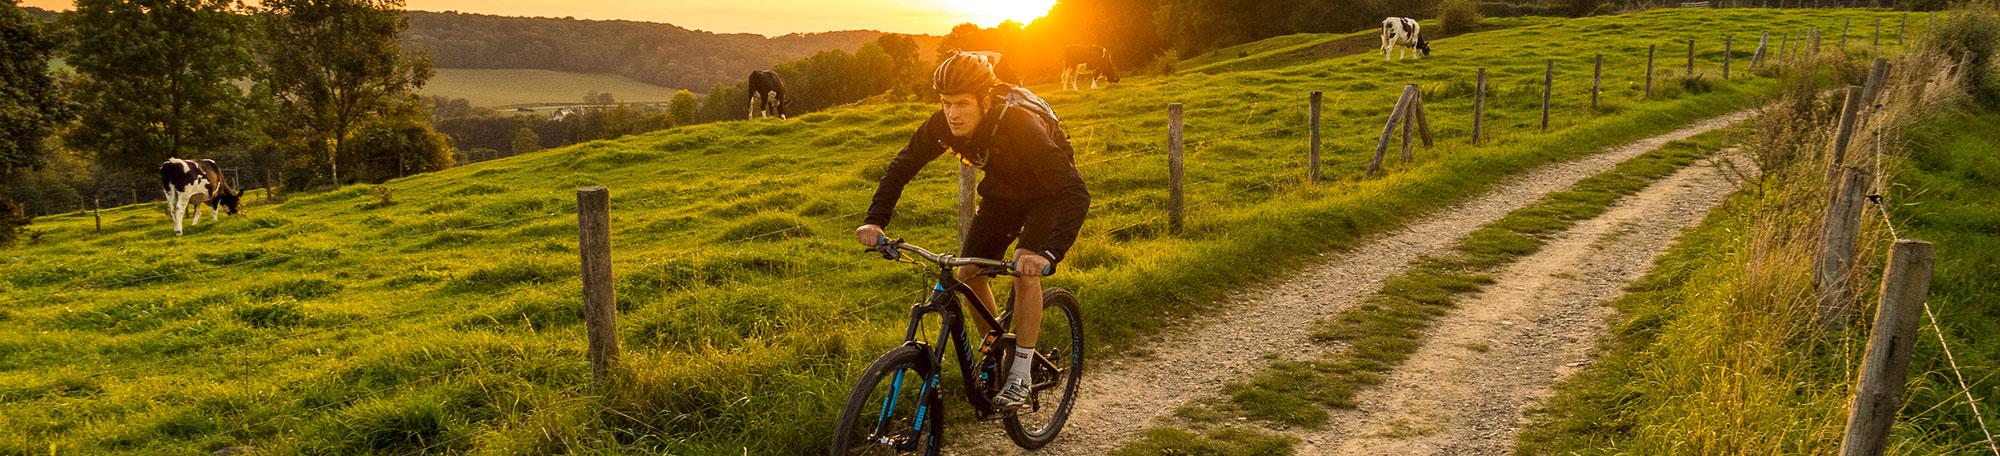 mountainbiken in Zuid Limburg